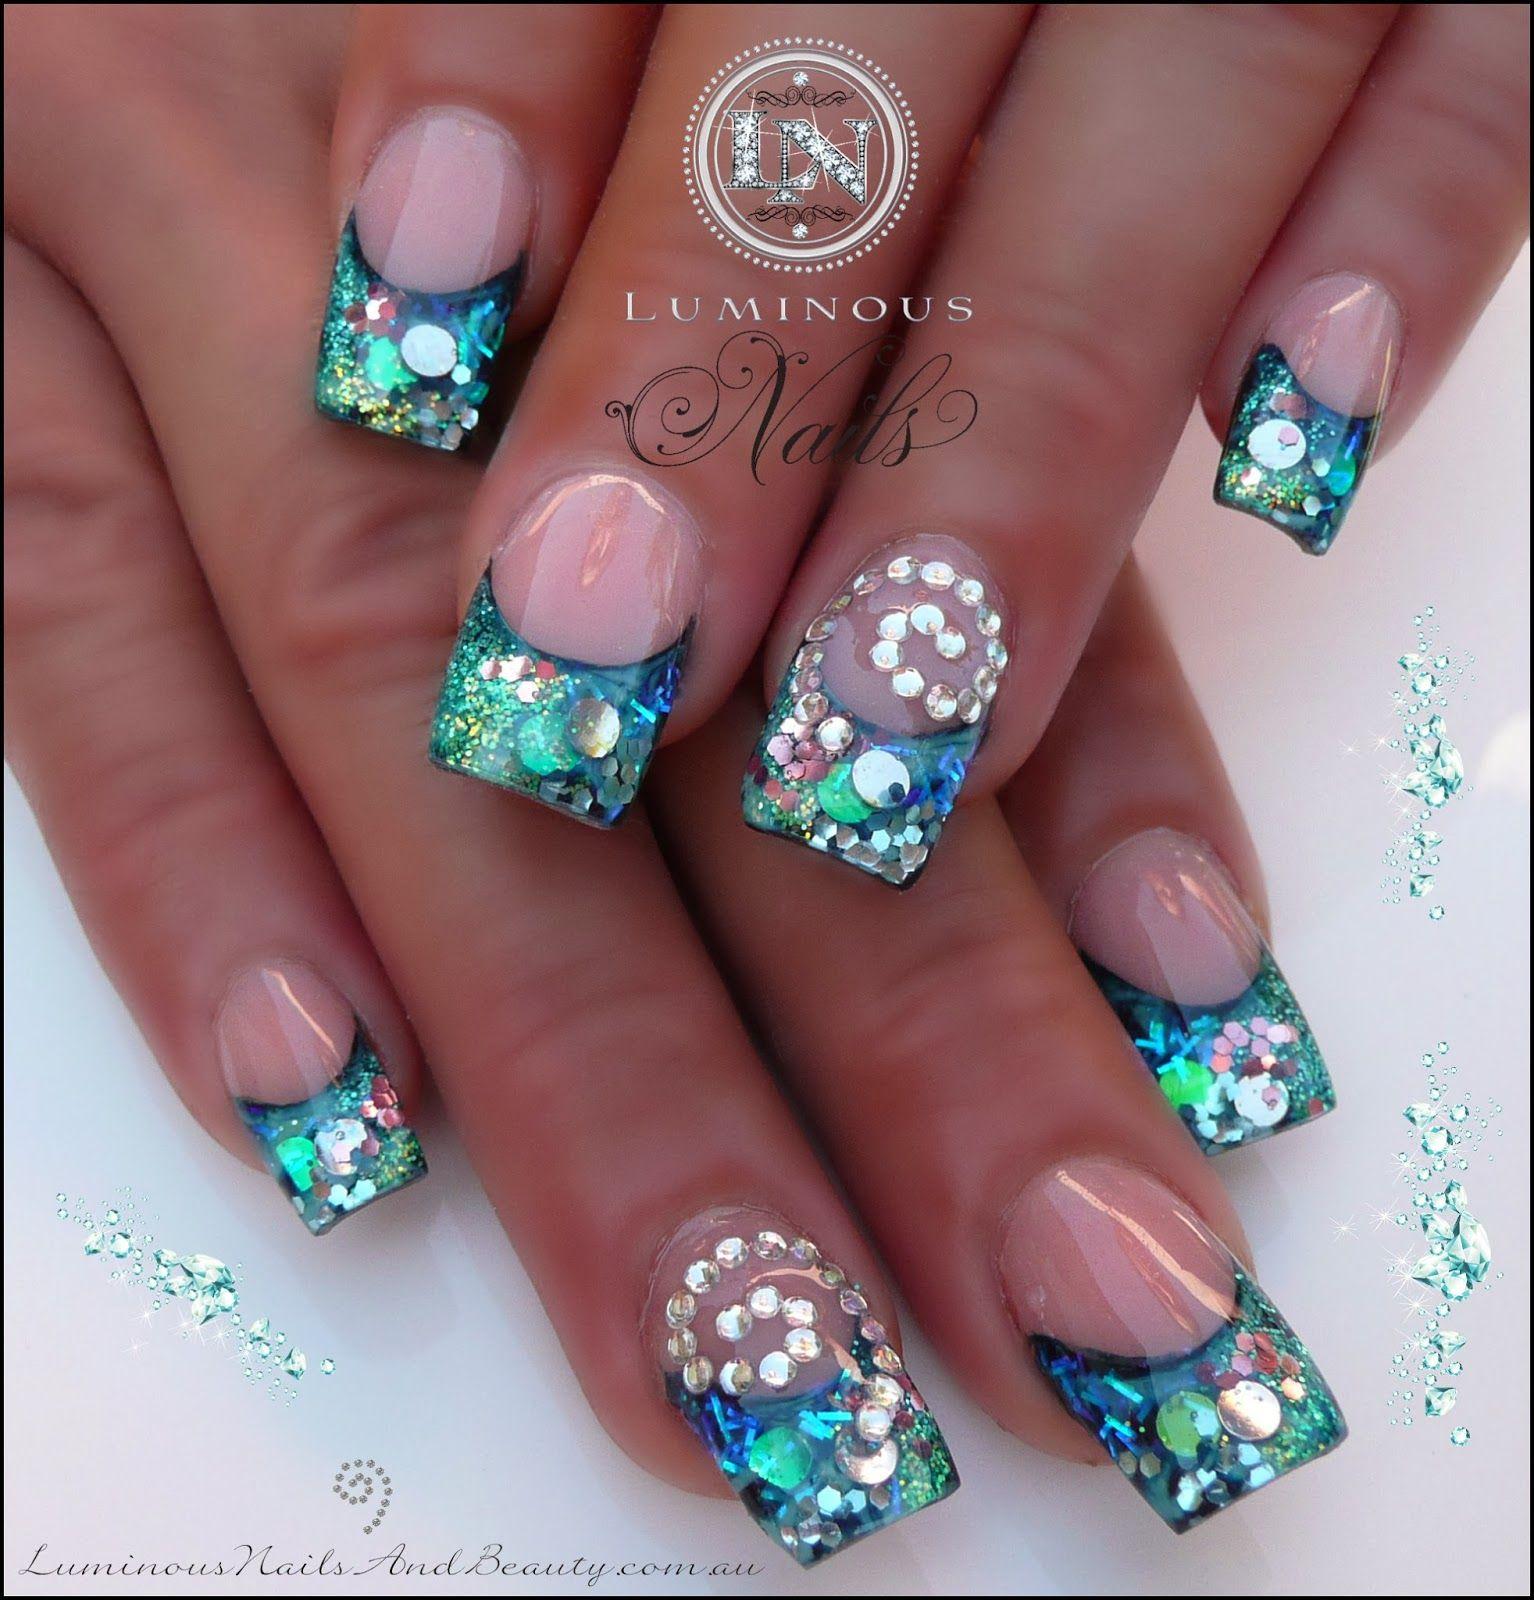 Glitter Gel Nail Polish Nz | Hession Hairdressing